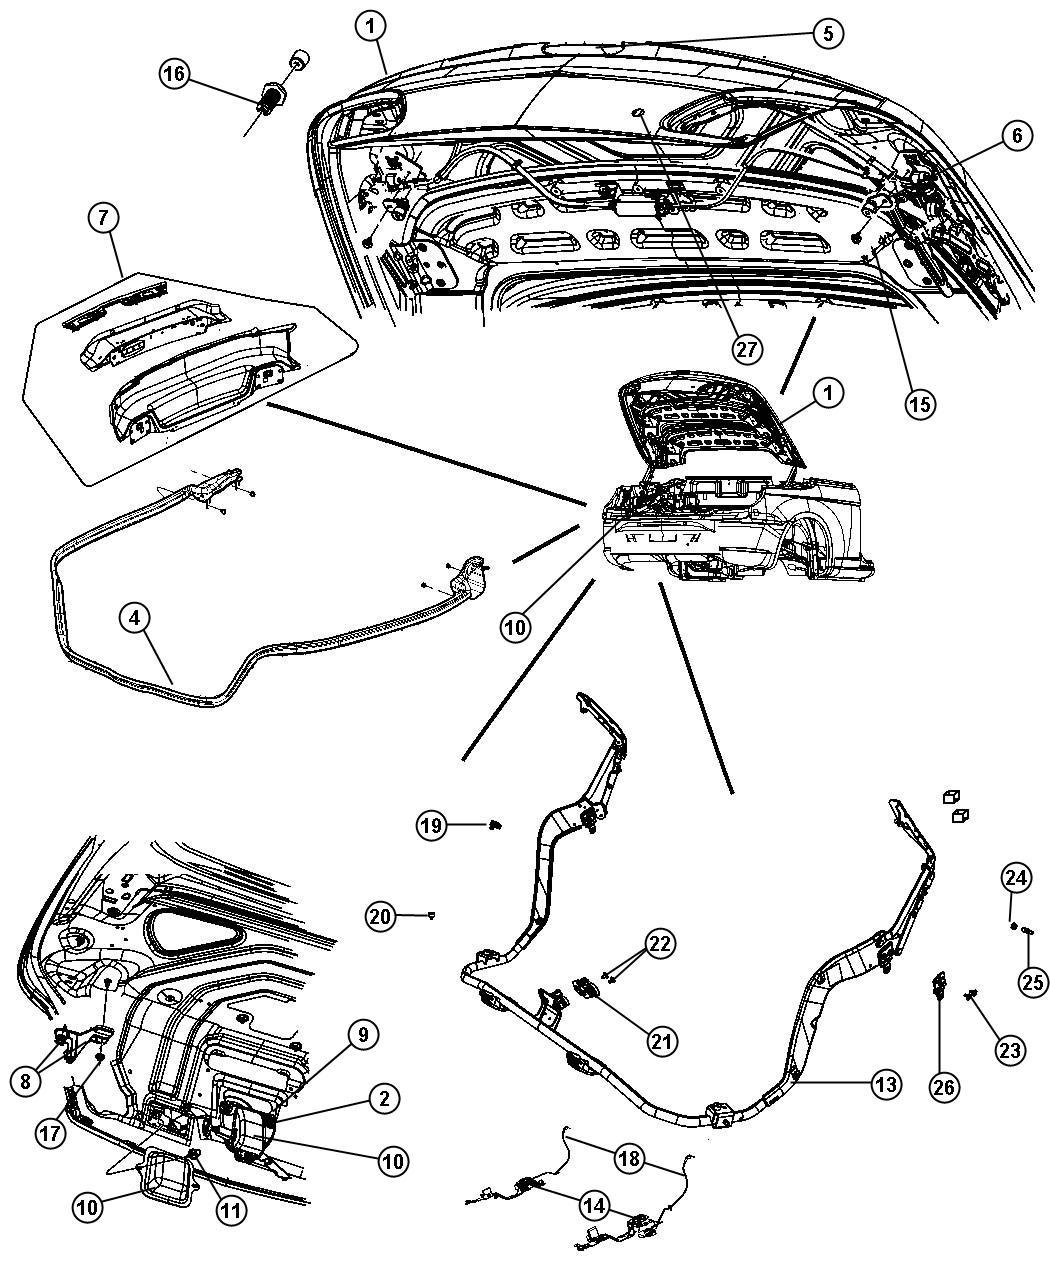 2007 Chrysler Sebring Striker. Decklid latch. Before 1/8